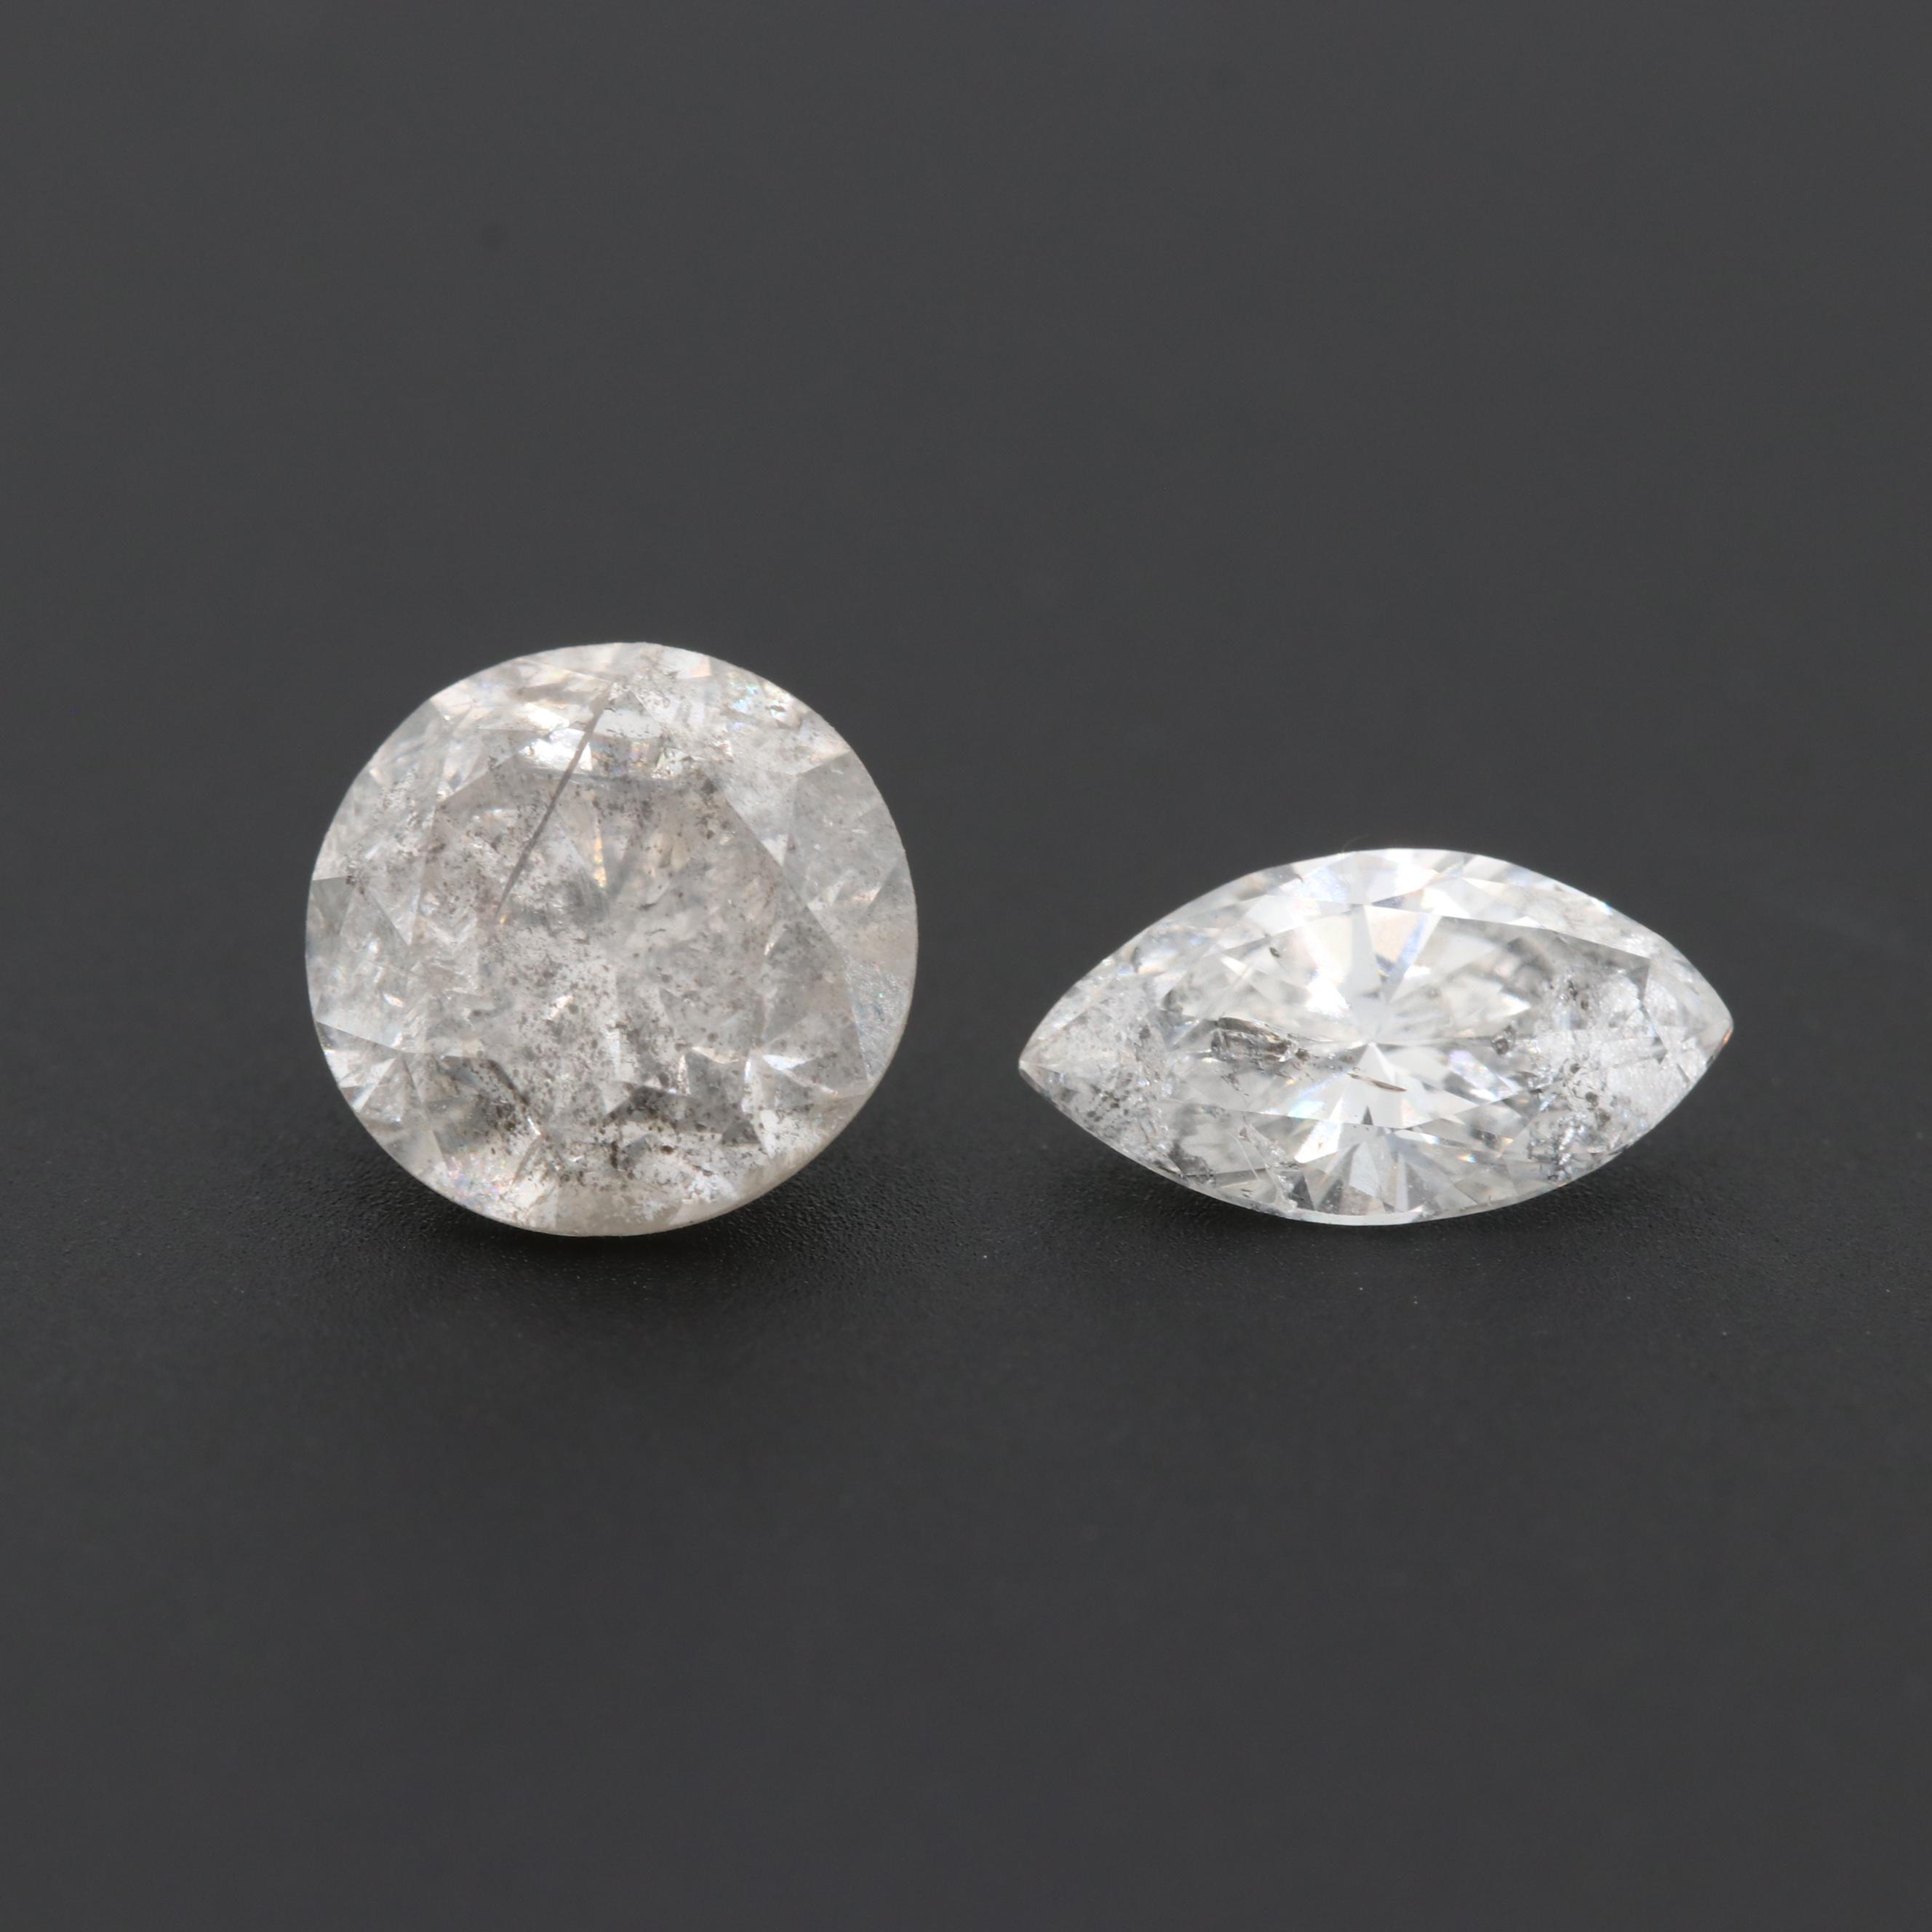 Loose 2.10 CTW Diamond Gemstones